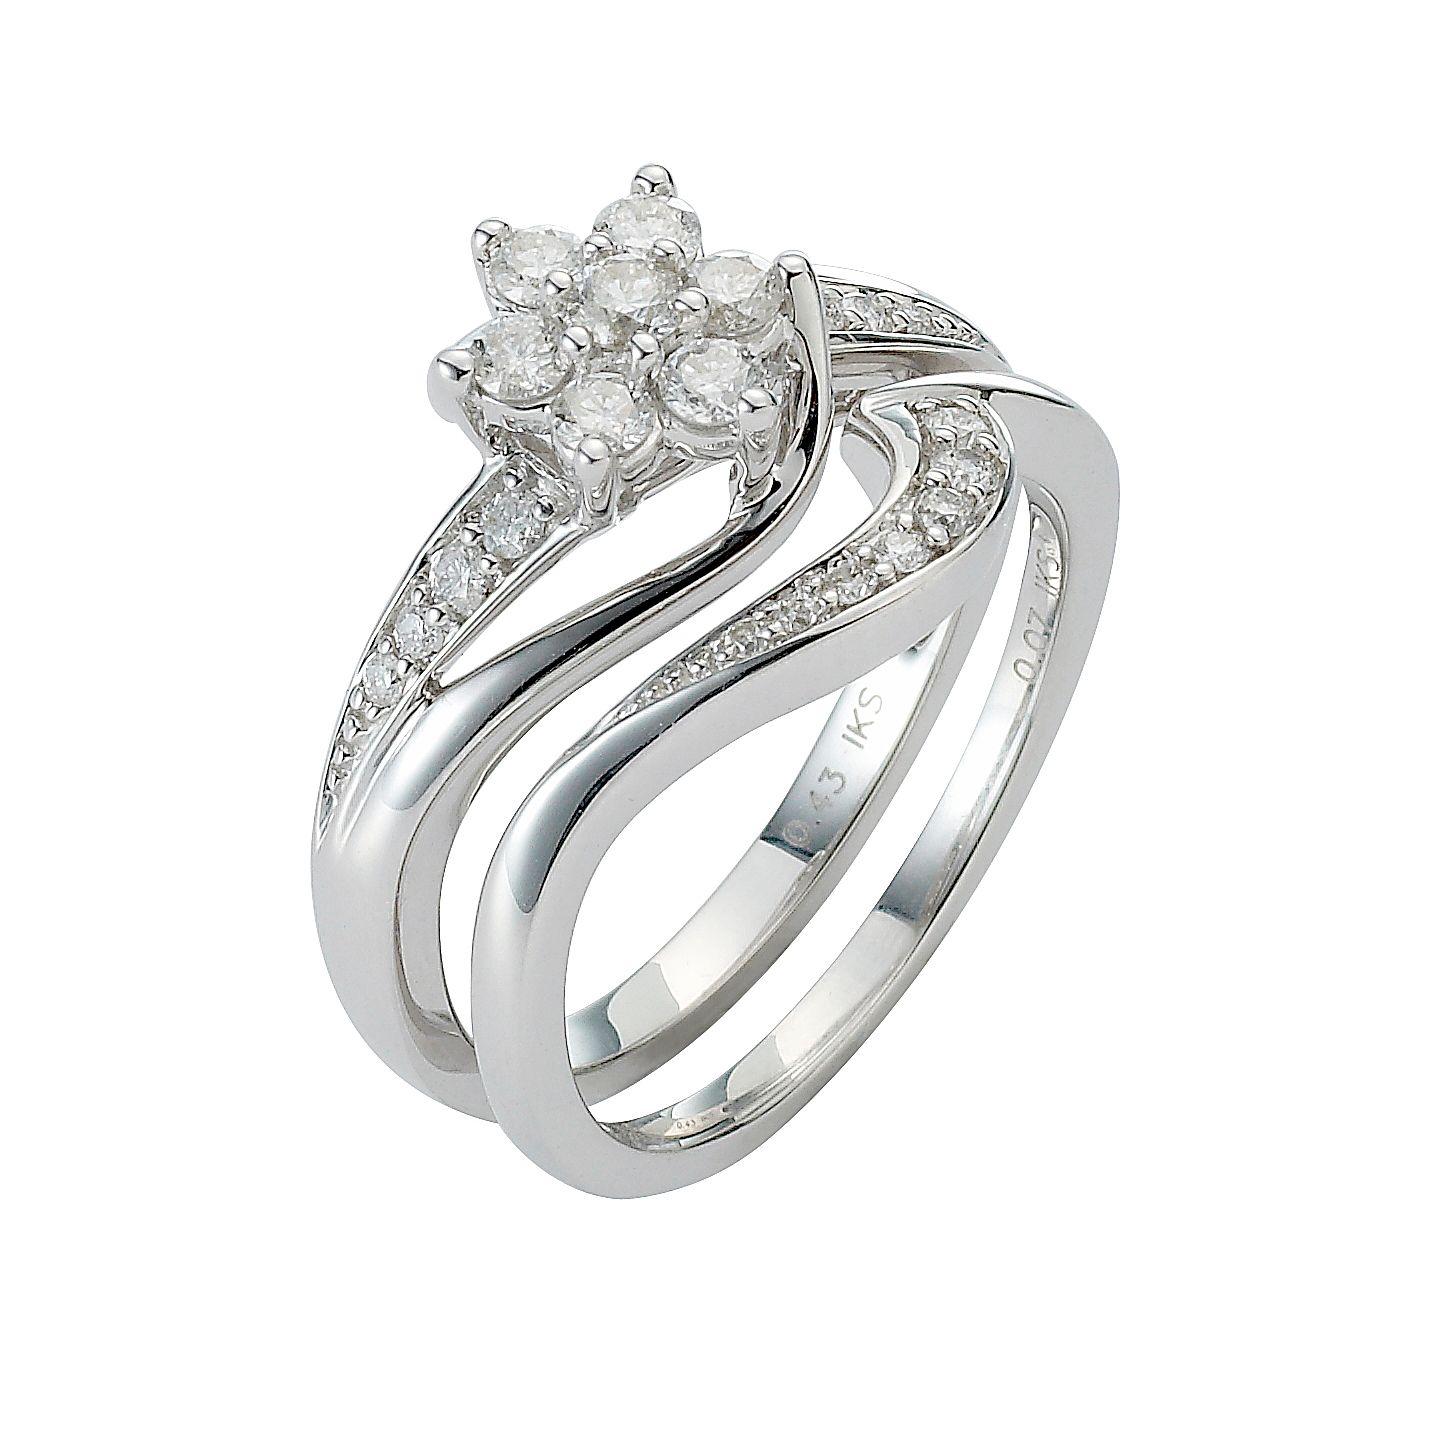 Perfect Fit Diamond Jewellery